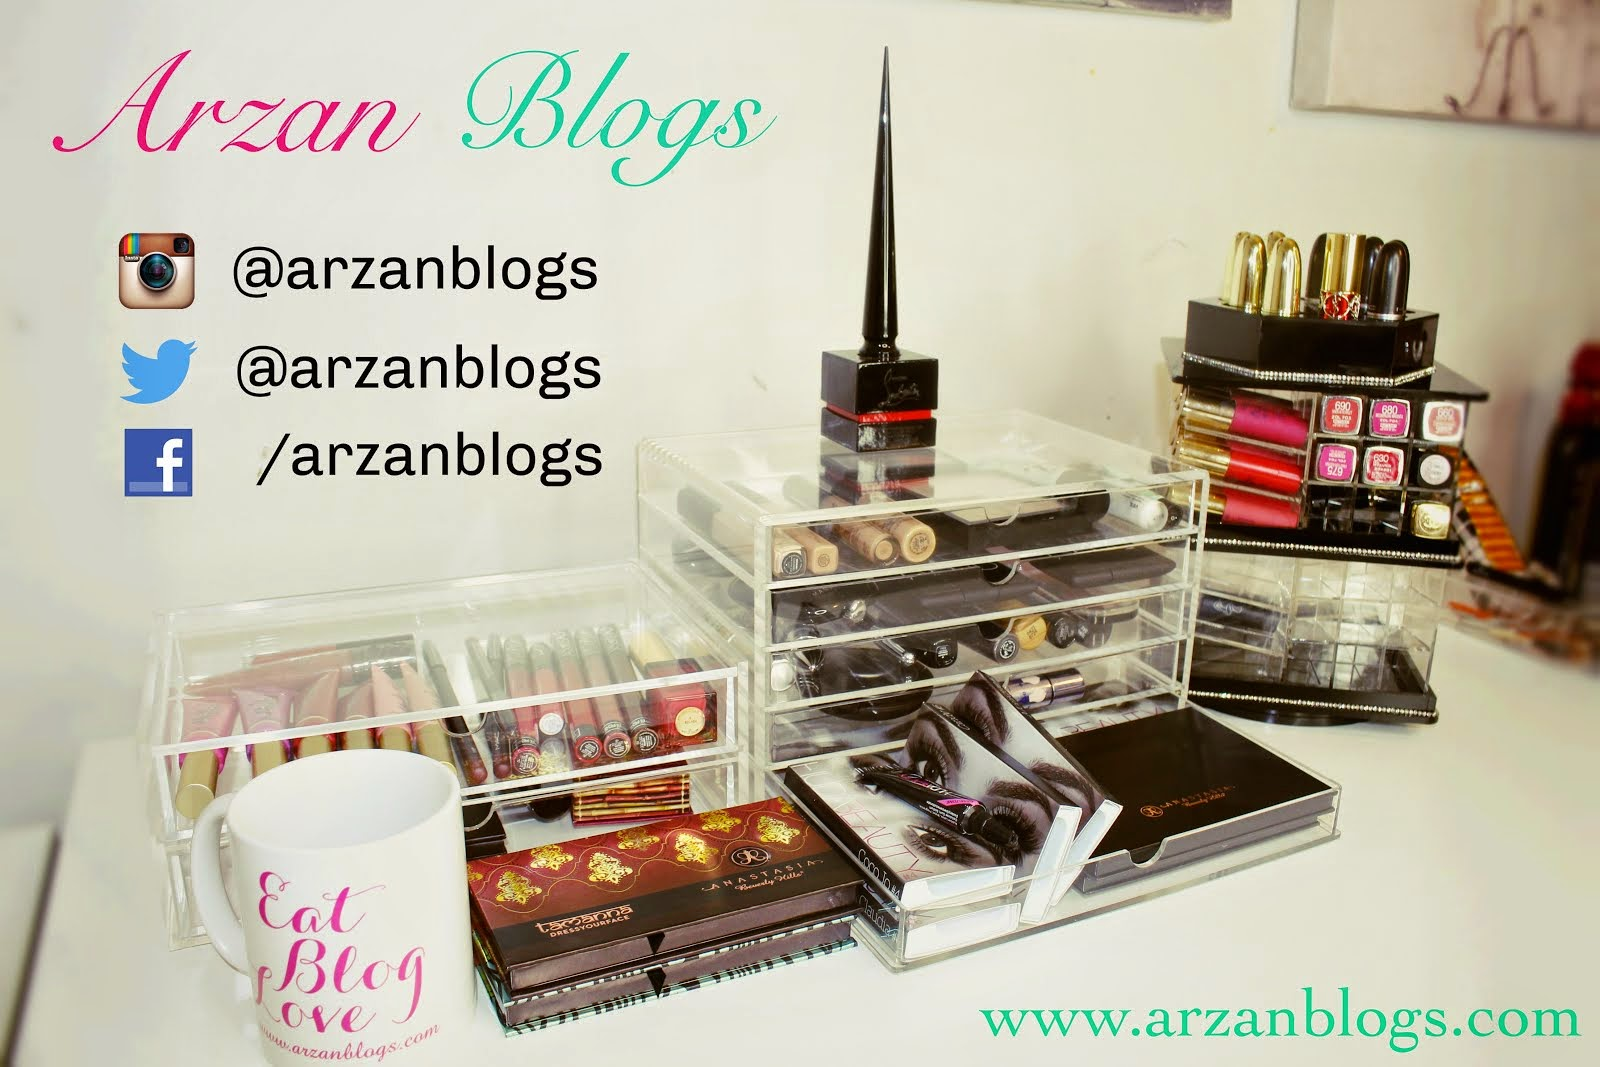 www.arzanblogs.com